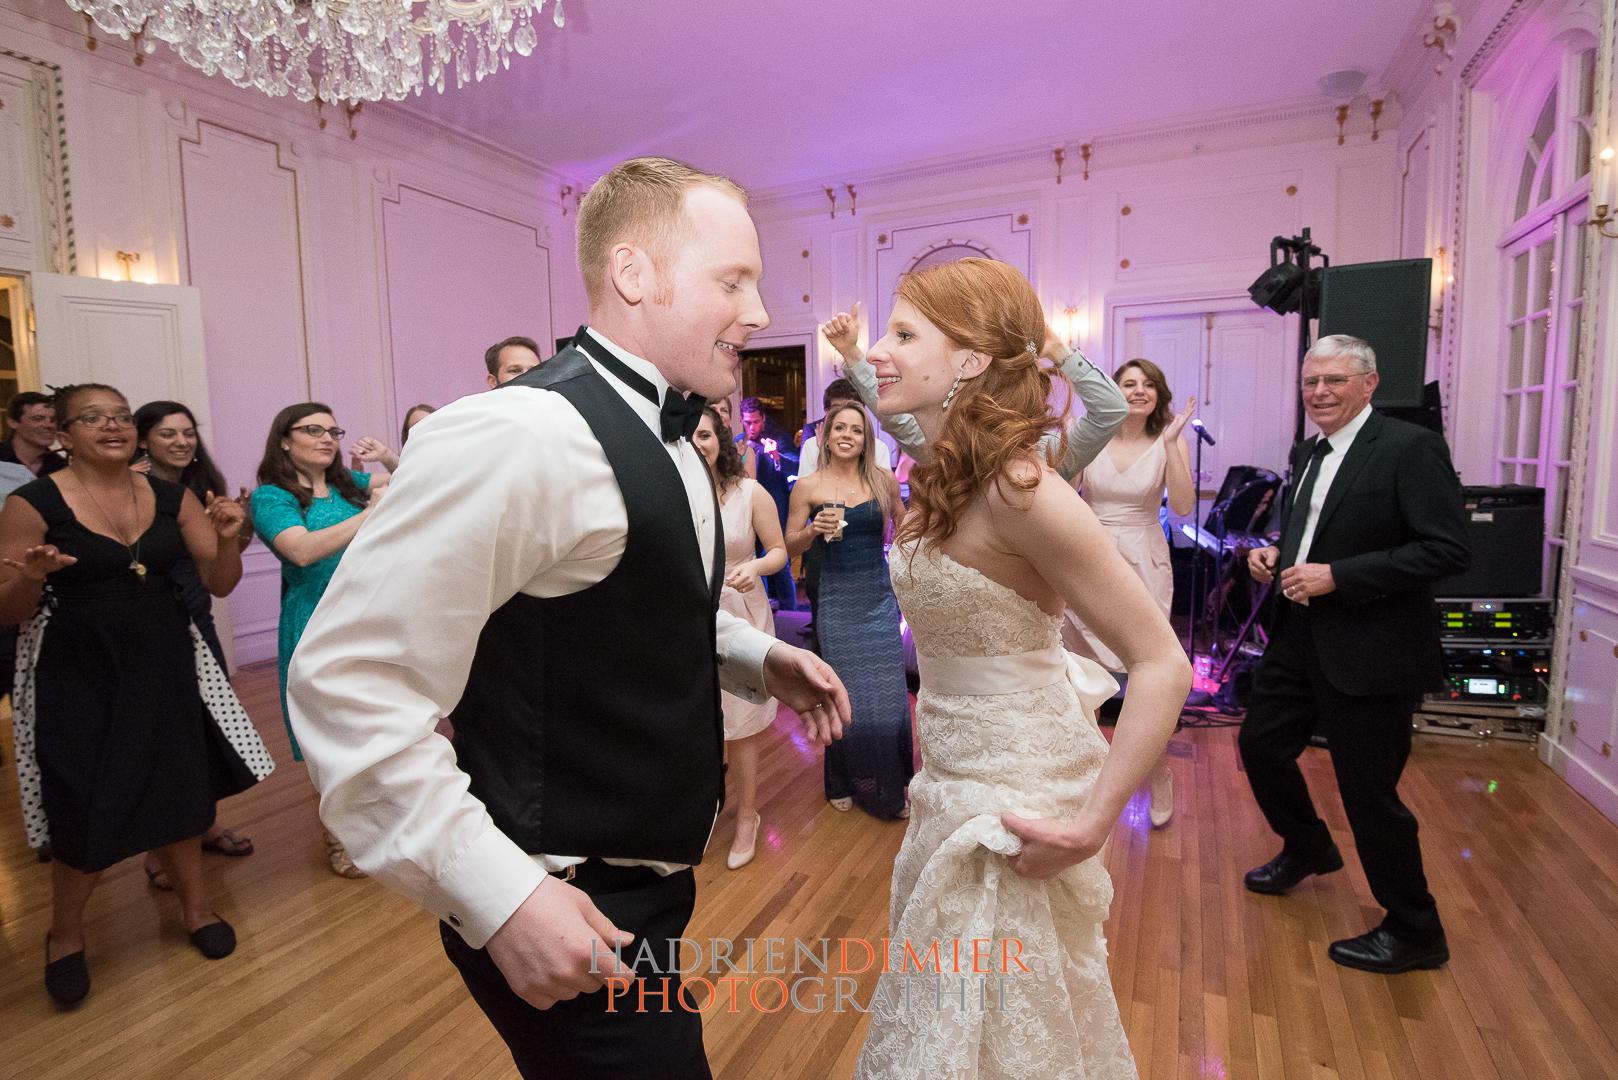 Wilson-Stevens-Productions-Splash-Band-Wedding-Hadrien Dimier Photographie-160422-00521